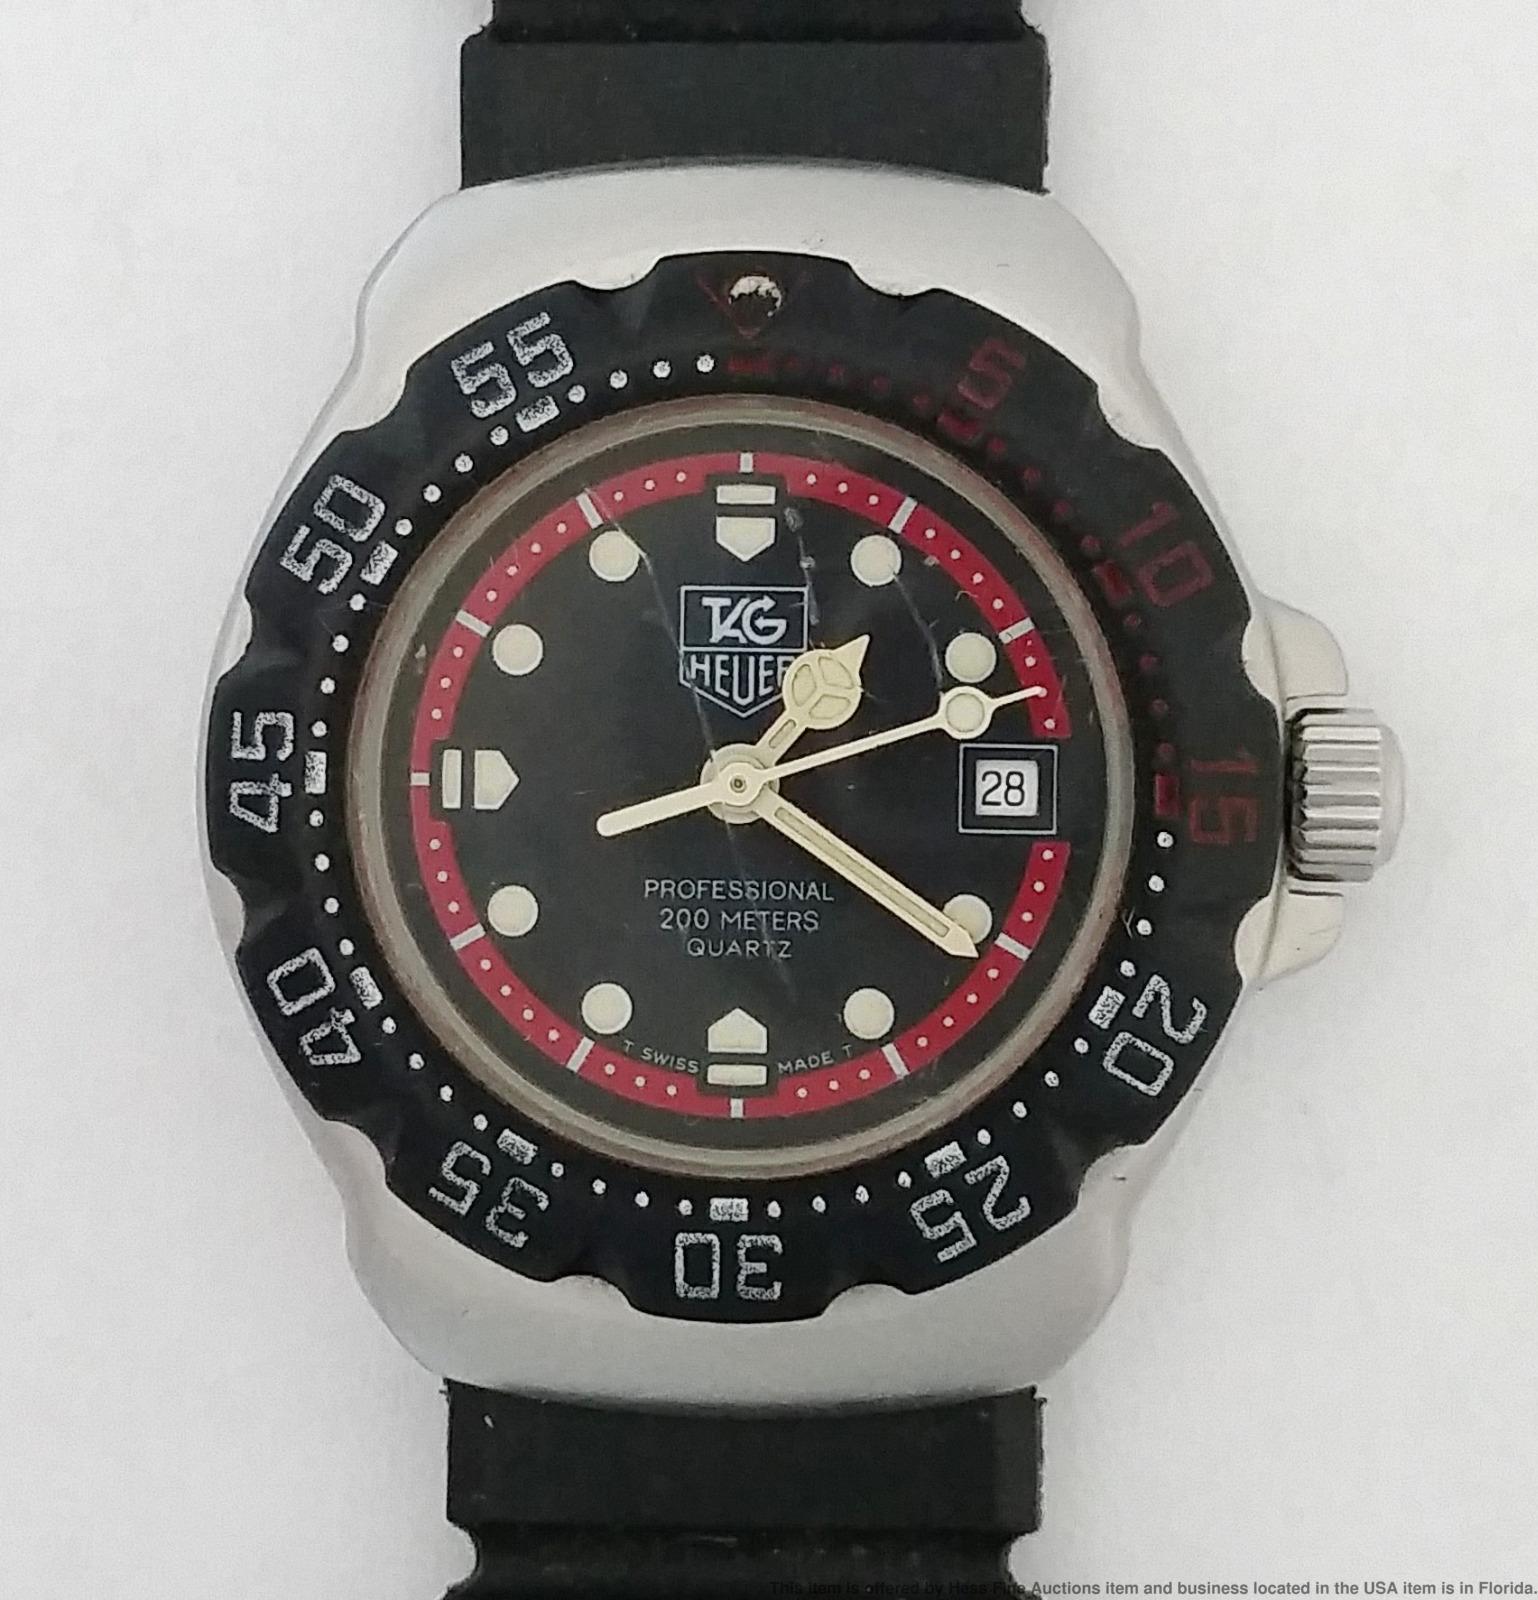 af15c1c8e9d Detalhes sobre Vintage Tag Heuer WA1414 200m Sport Diver Senhoras Relógio De  Pulso Funcionando- mostrar título no original